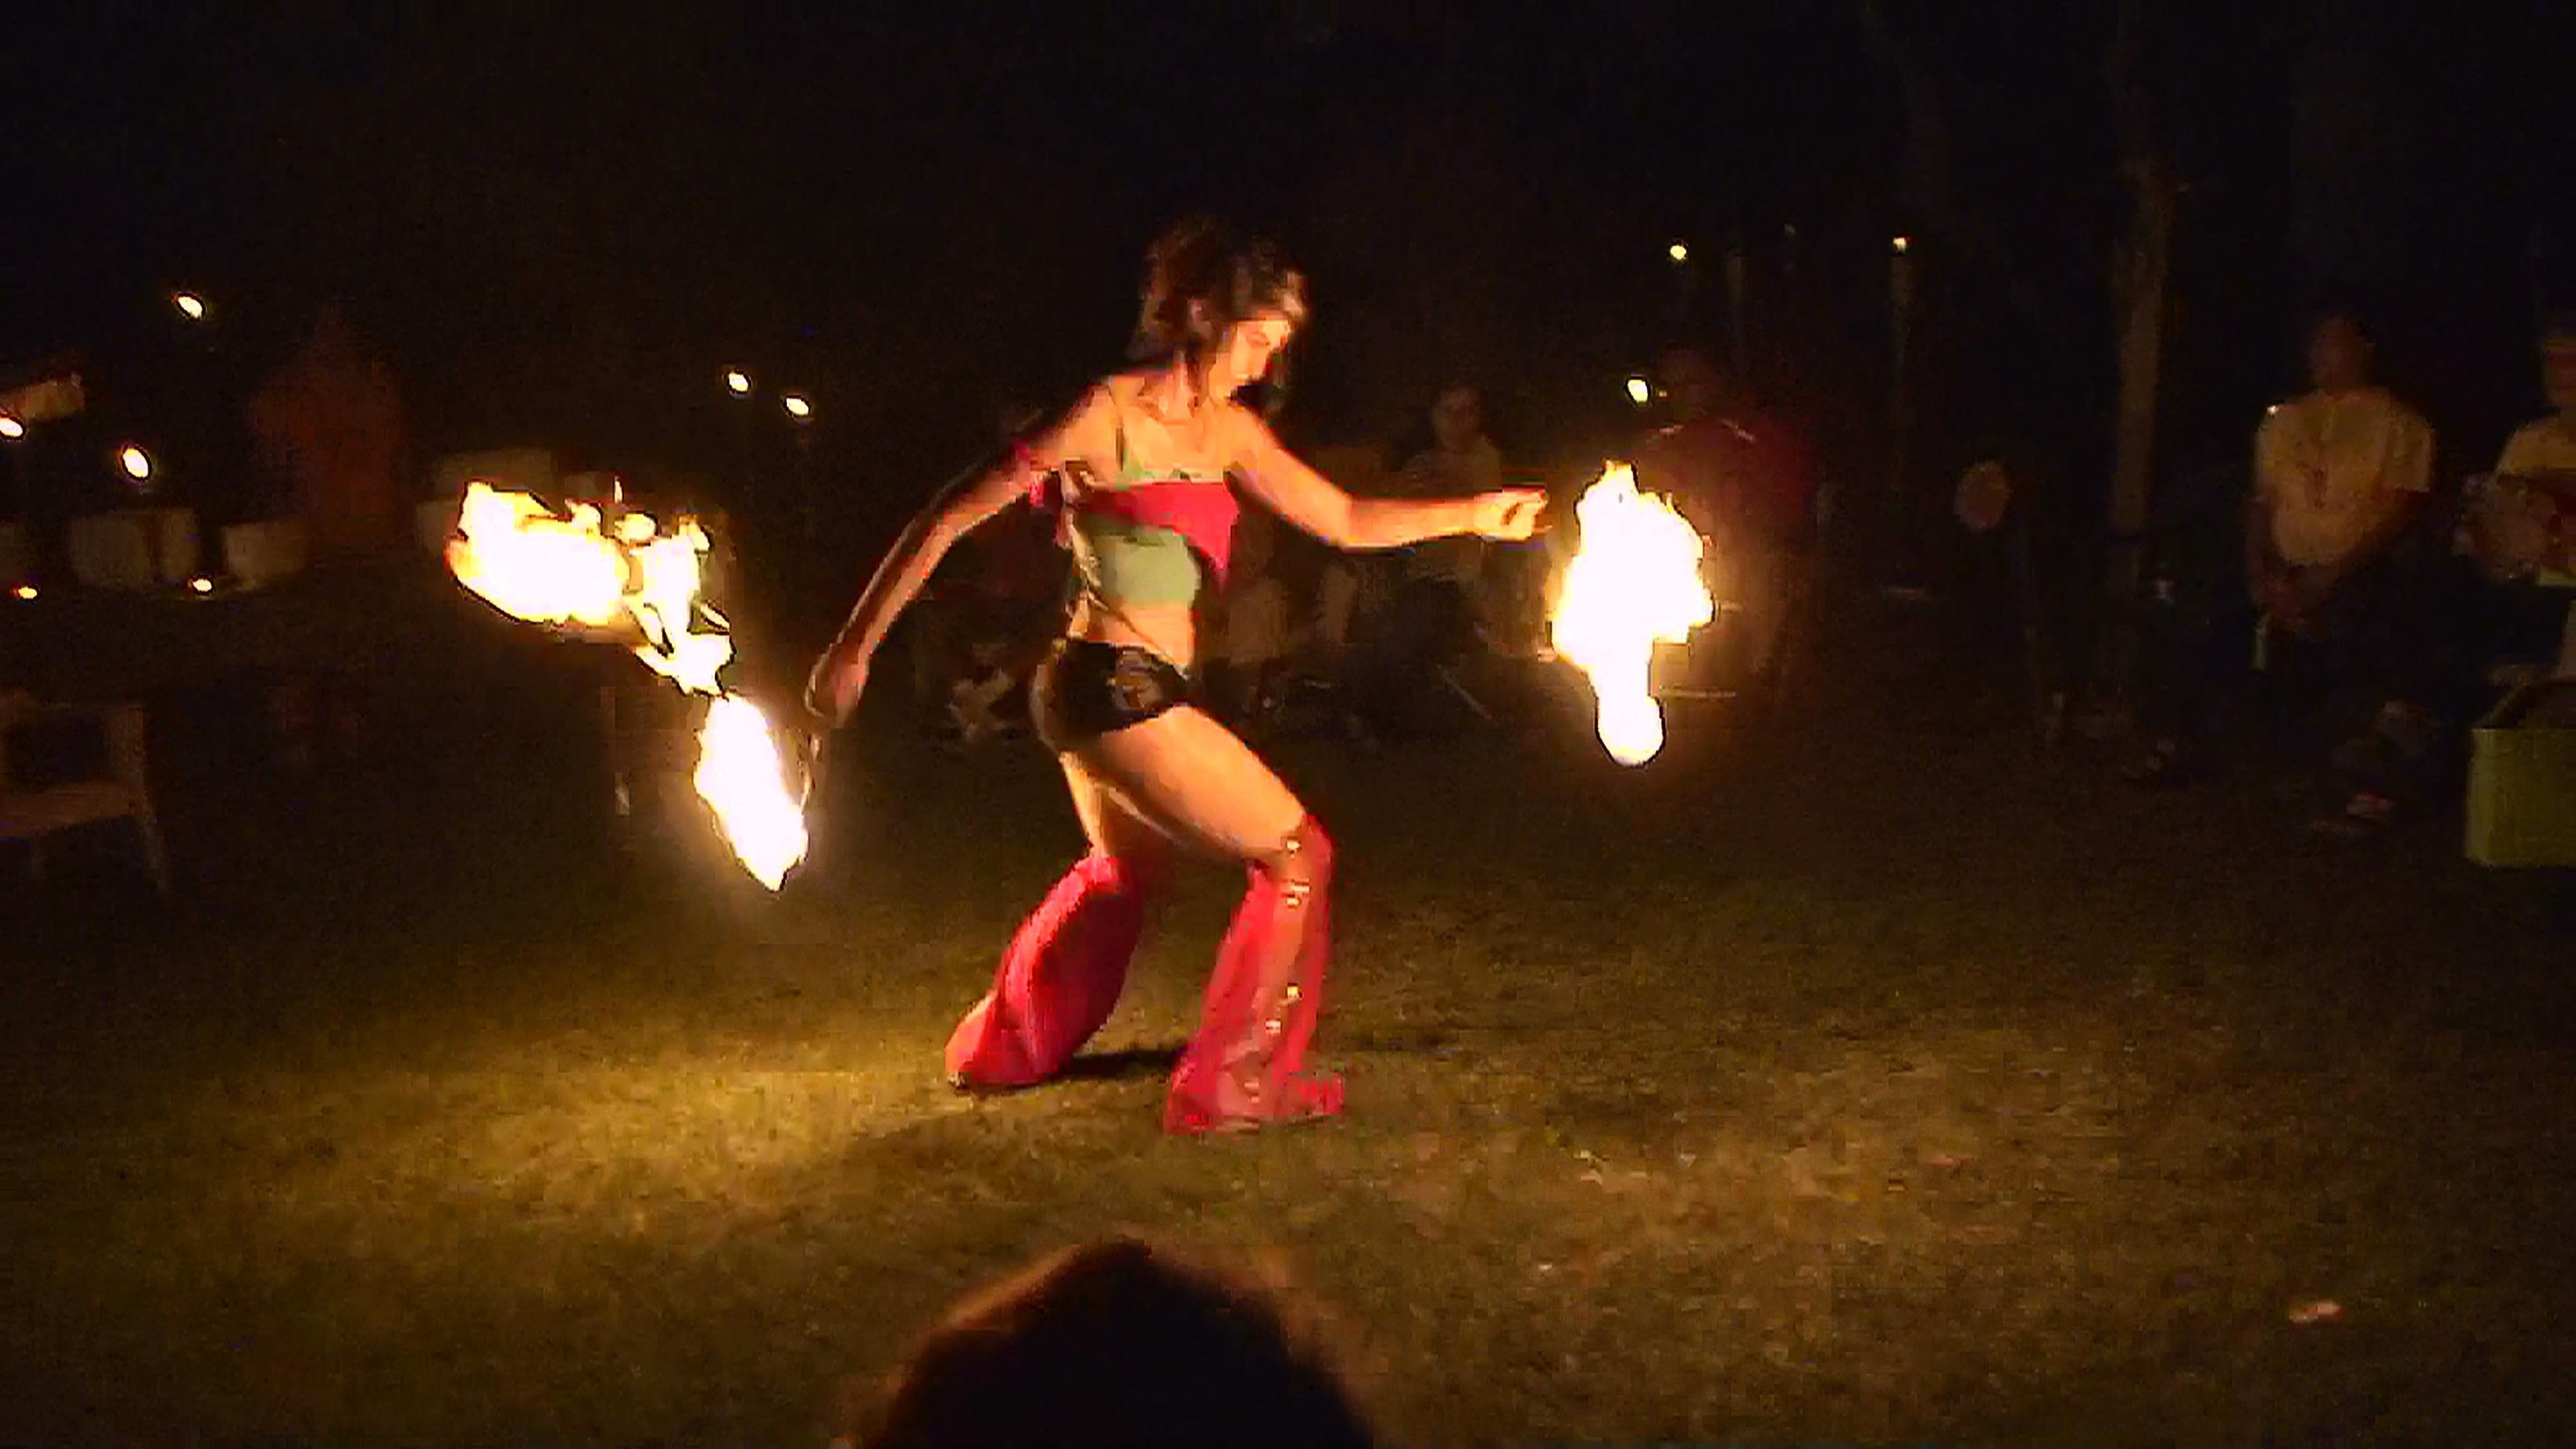 Full Moon - Rider - Fire Dance 10 - July 18 2008.JPG